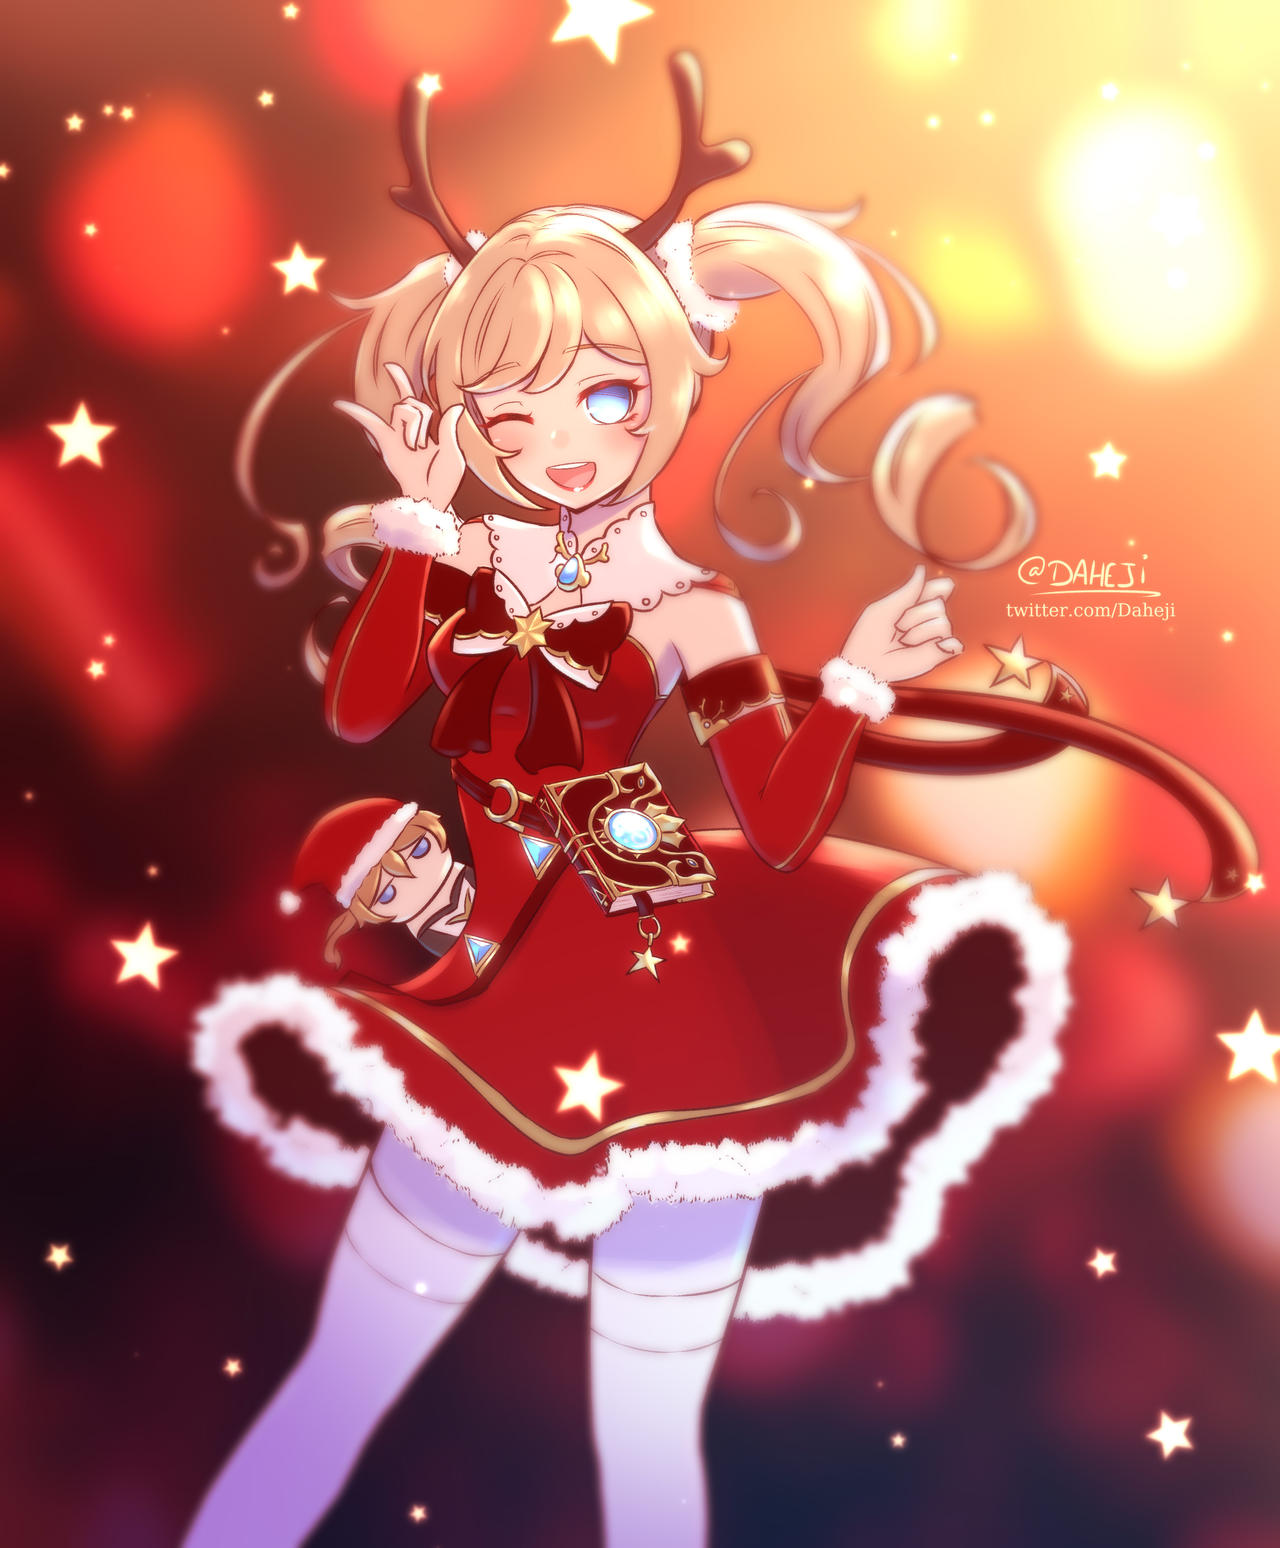 Genshin Impact Barbara Christmas